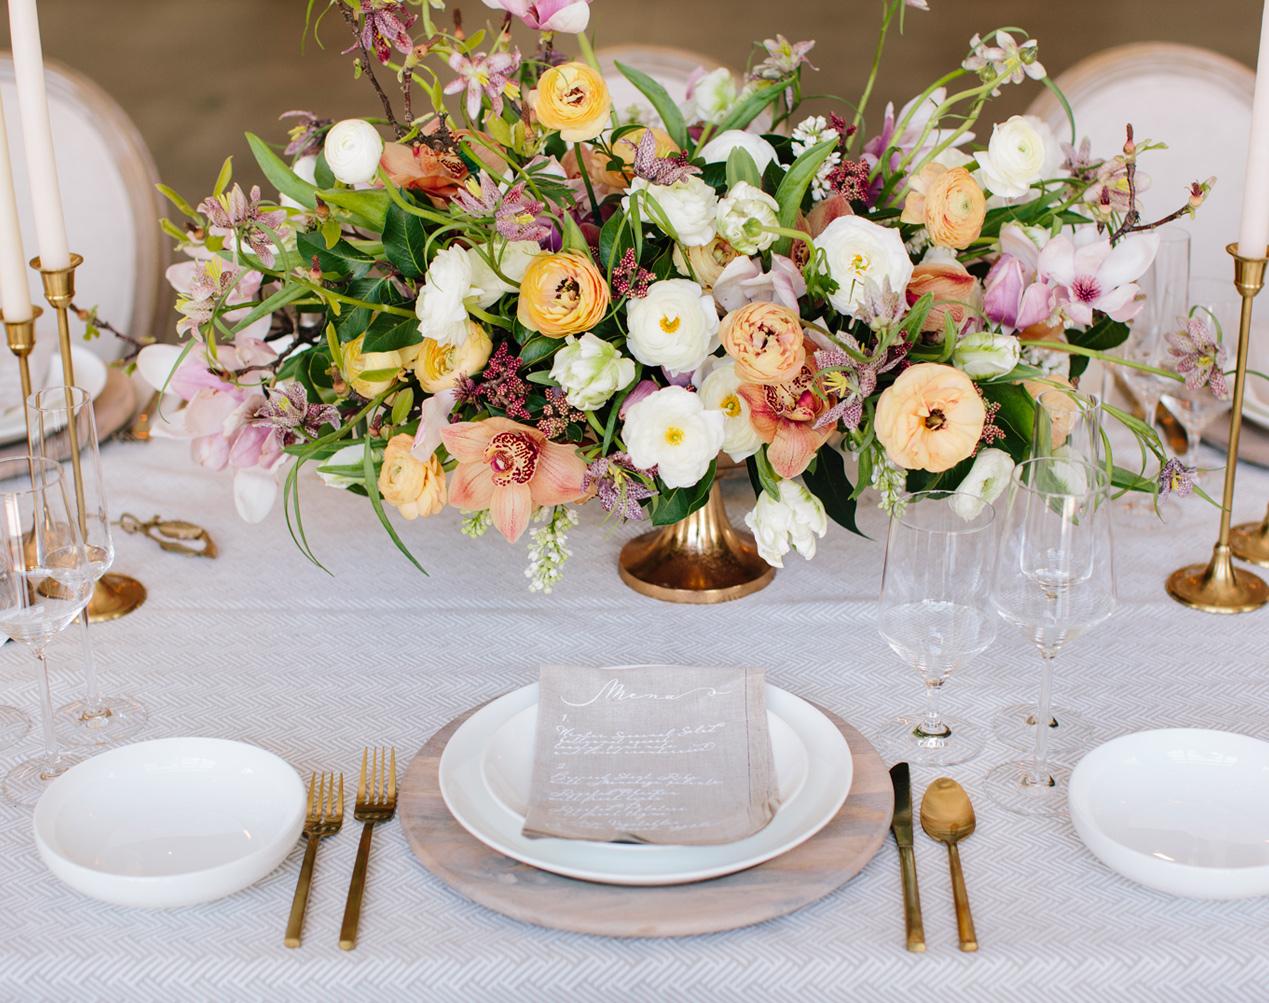 Wedding Table Arrangement Flowers by Salt Harbor Designs